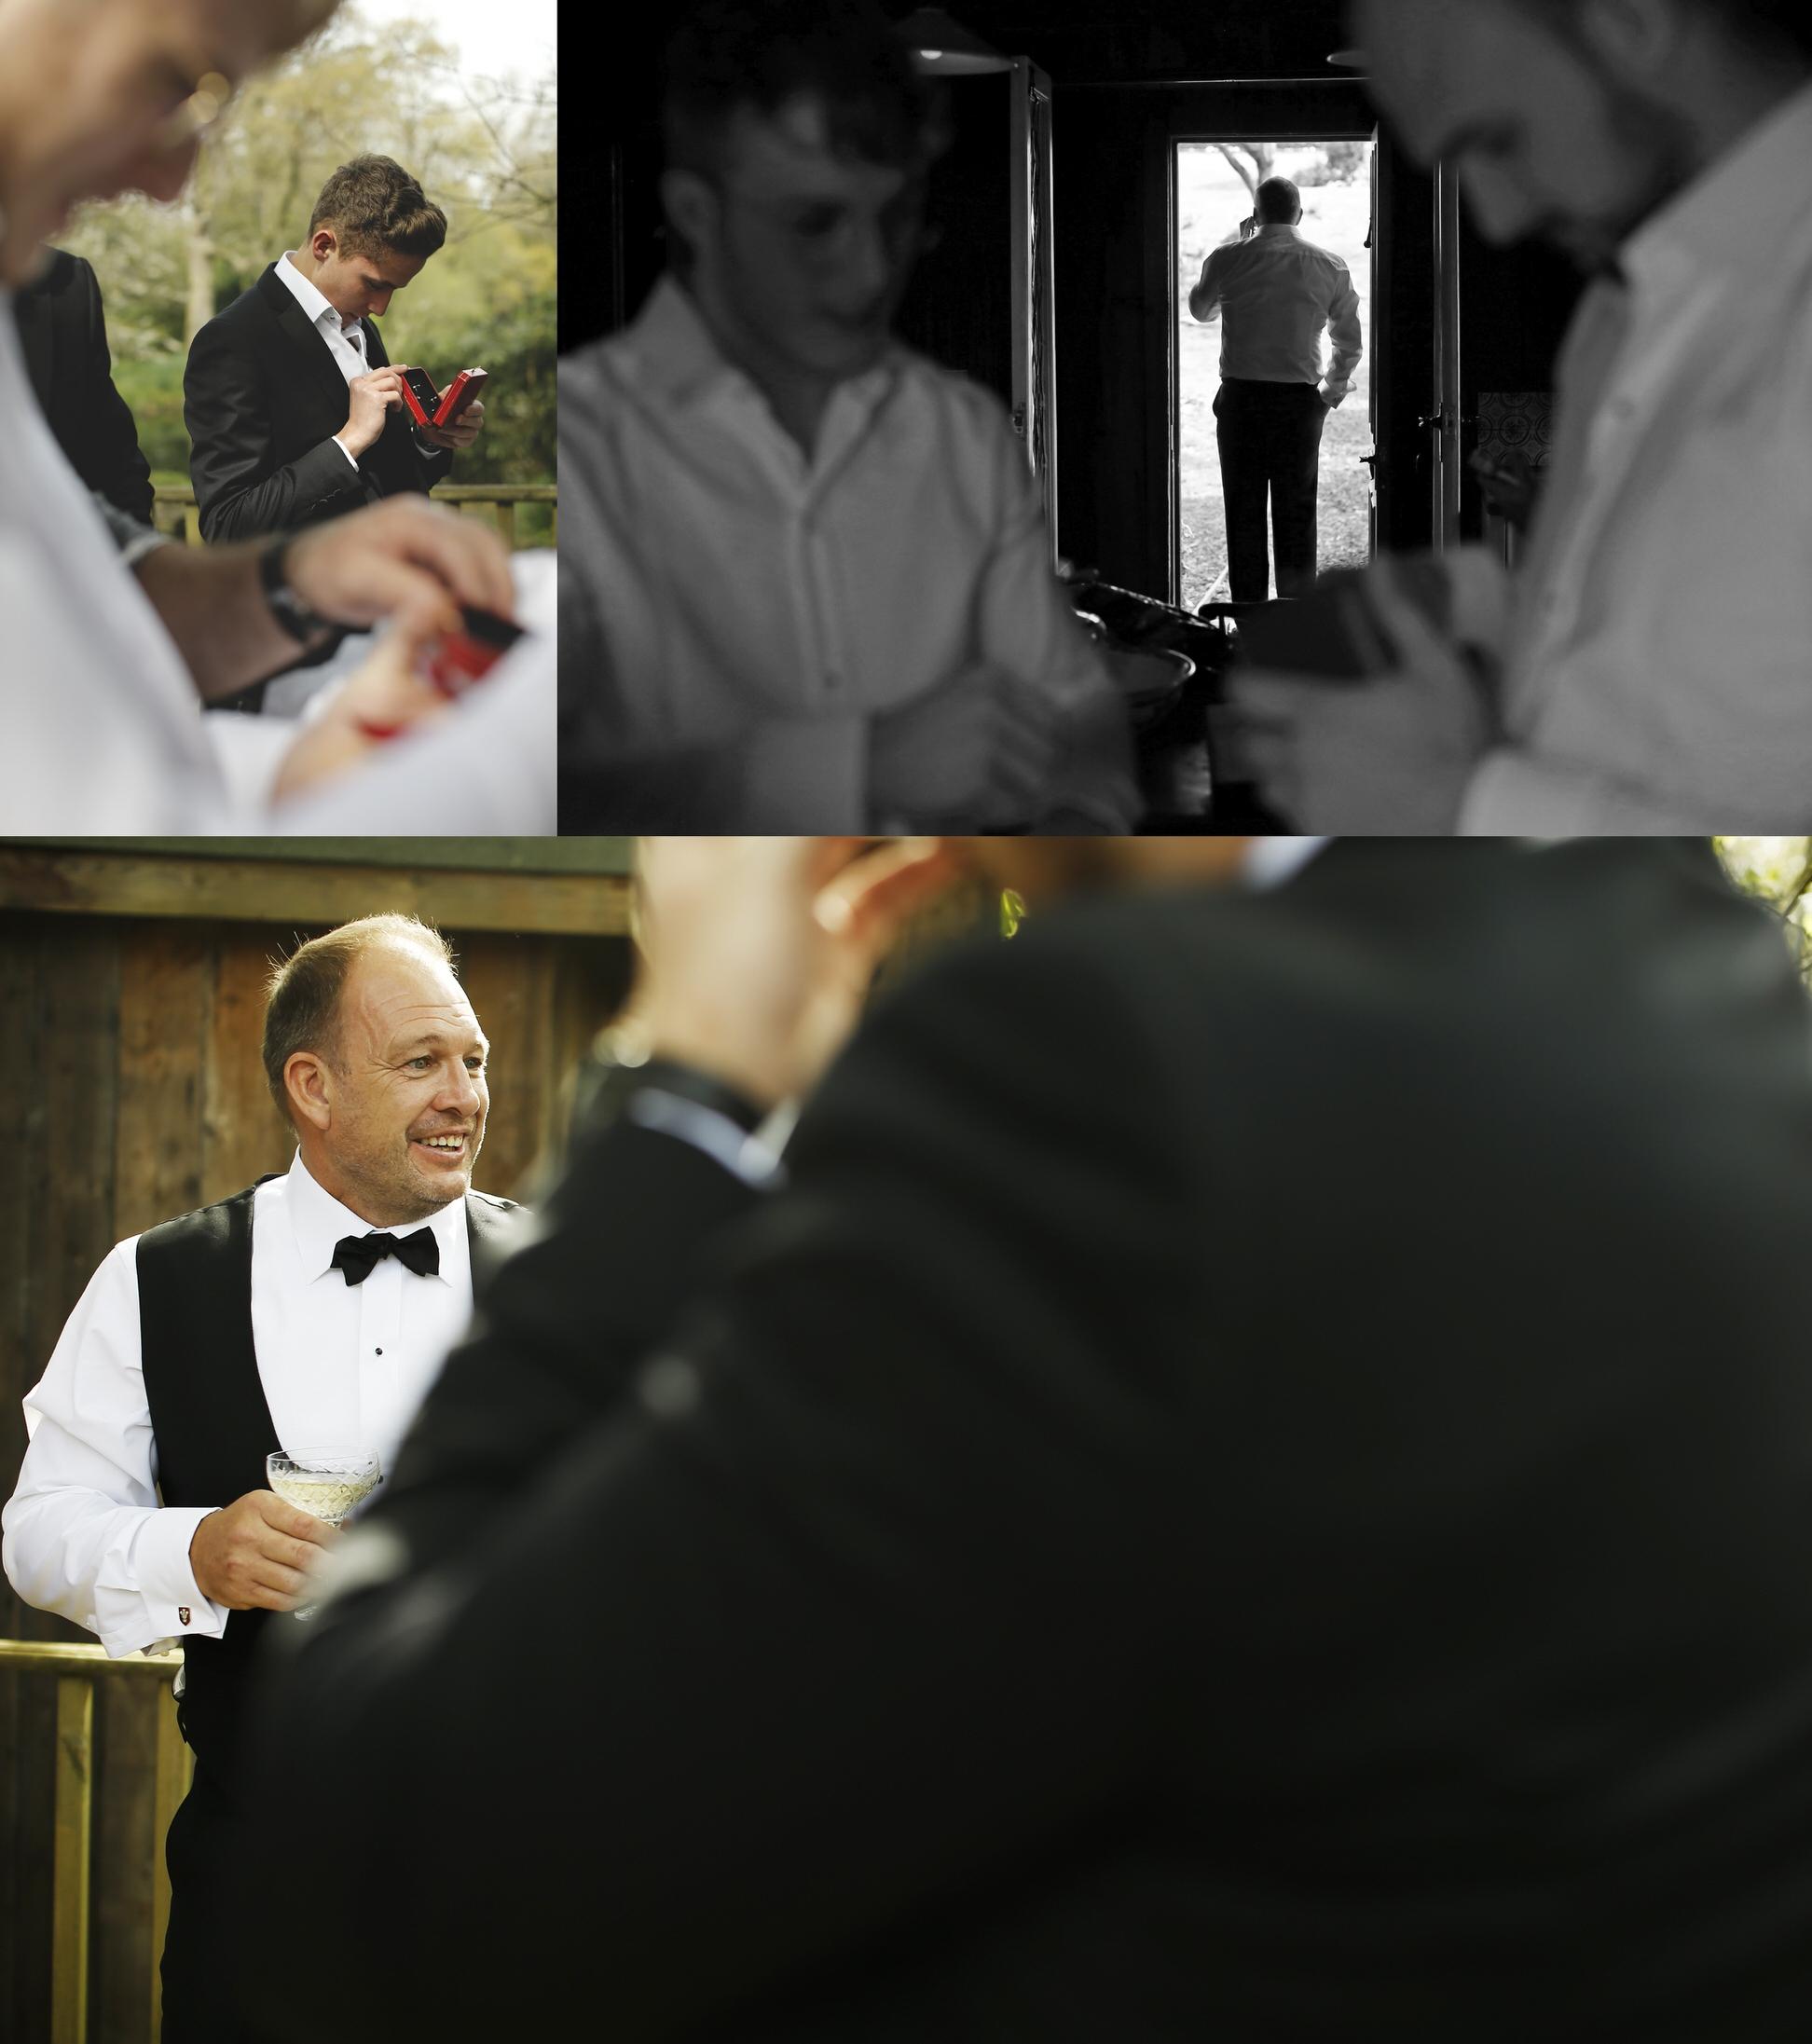 brettharkness-luxury-wedding-photographer-uk_0012.jpg